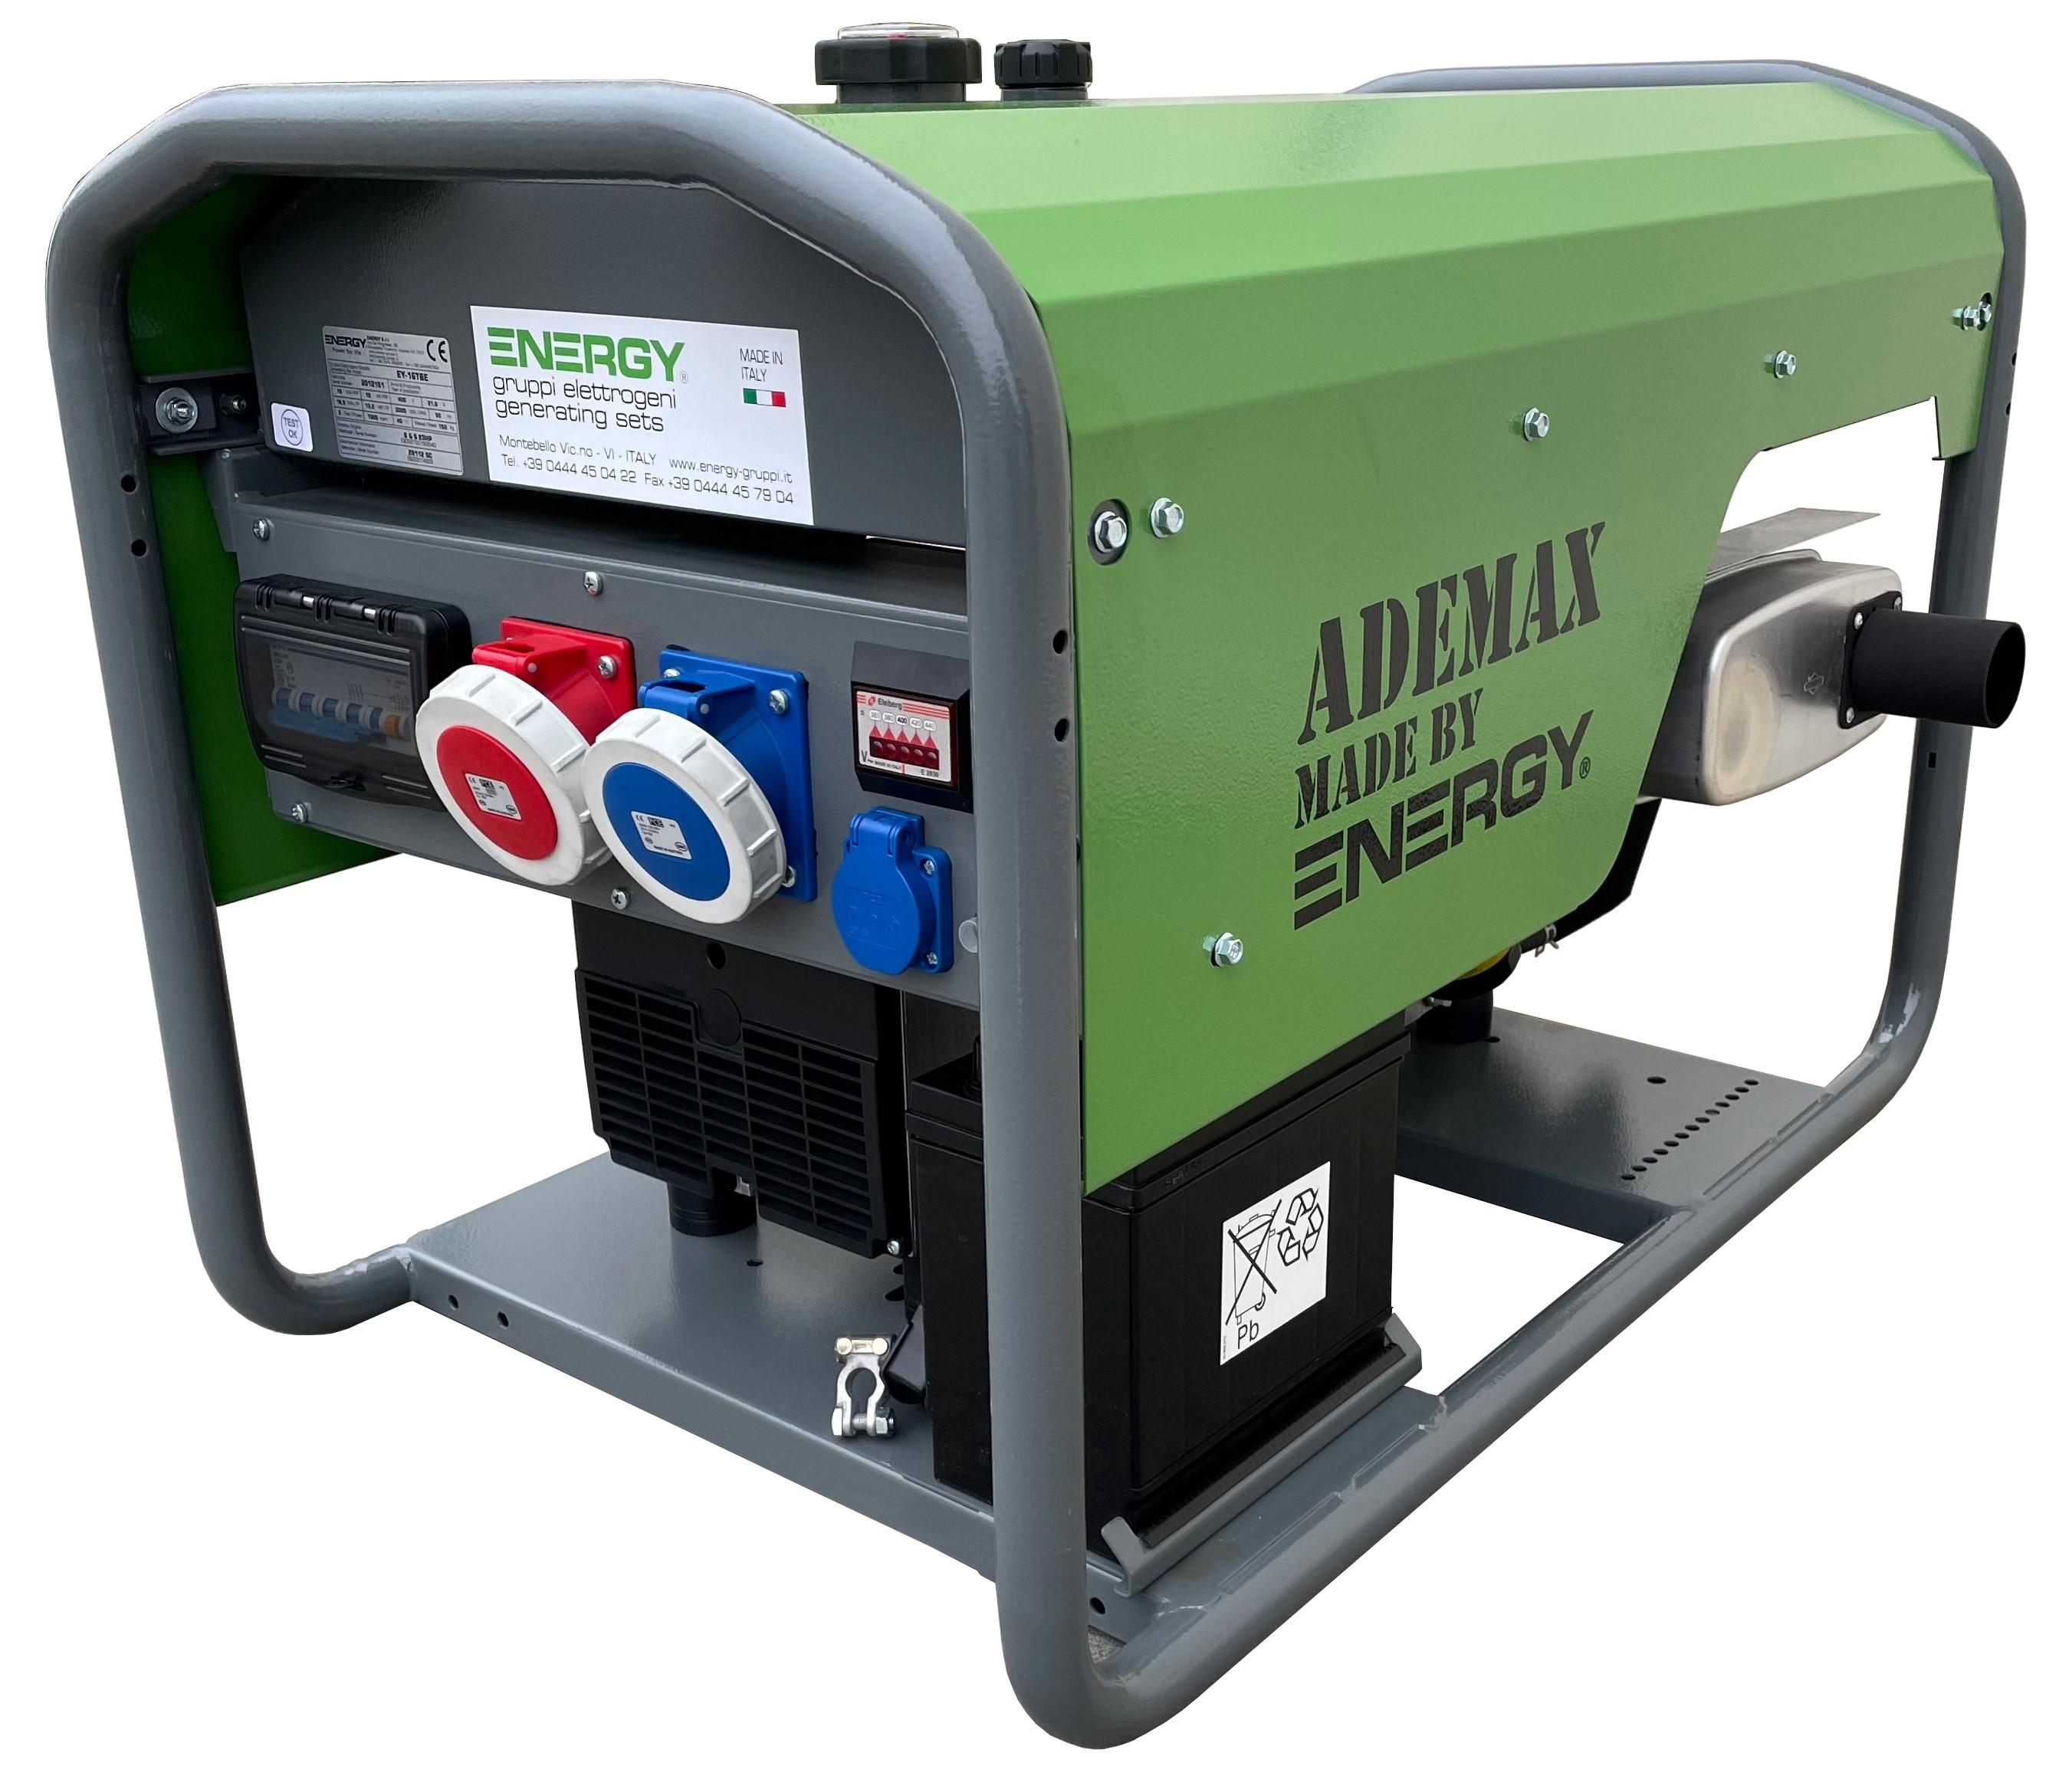 Energy 17,6 kVA Stromaggregat Teil-Schallschutz AVR 400 V EY16TBE Ademax